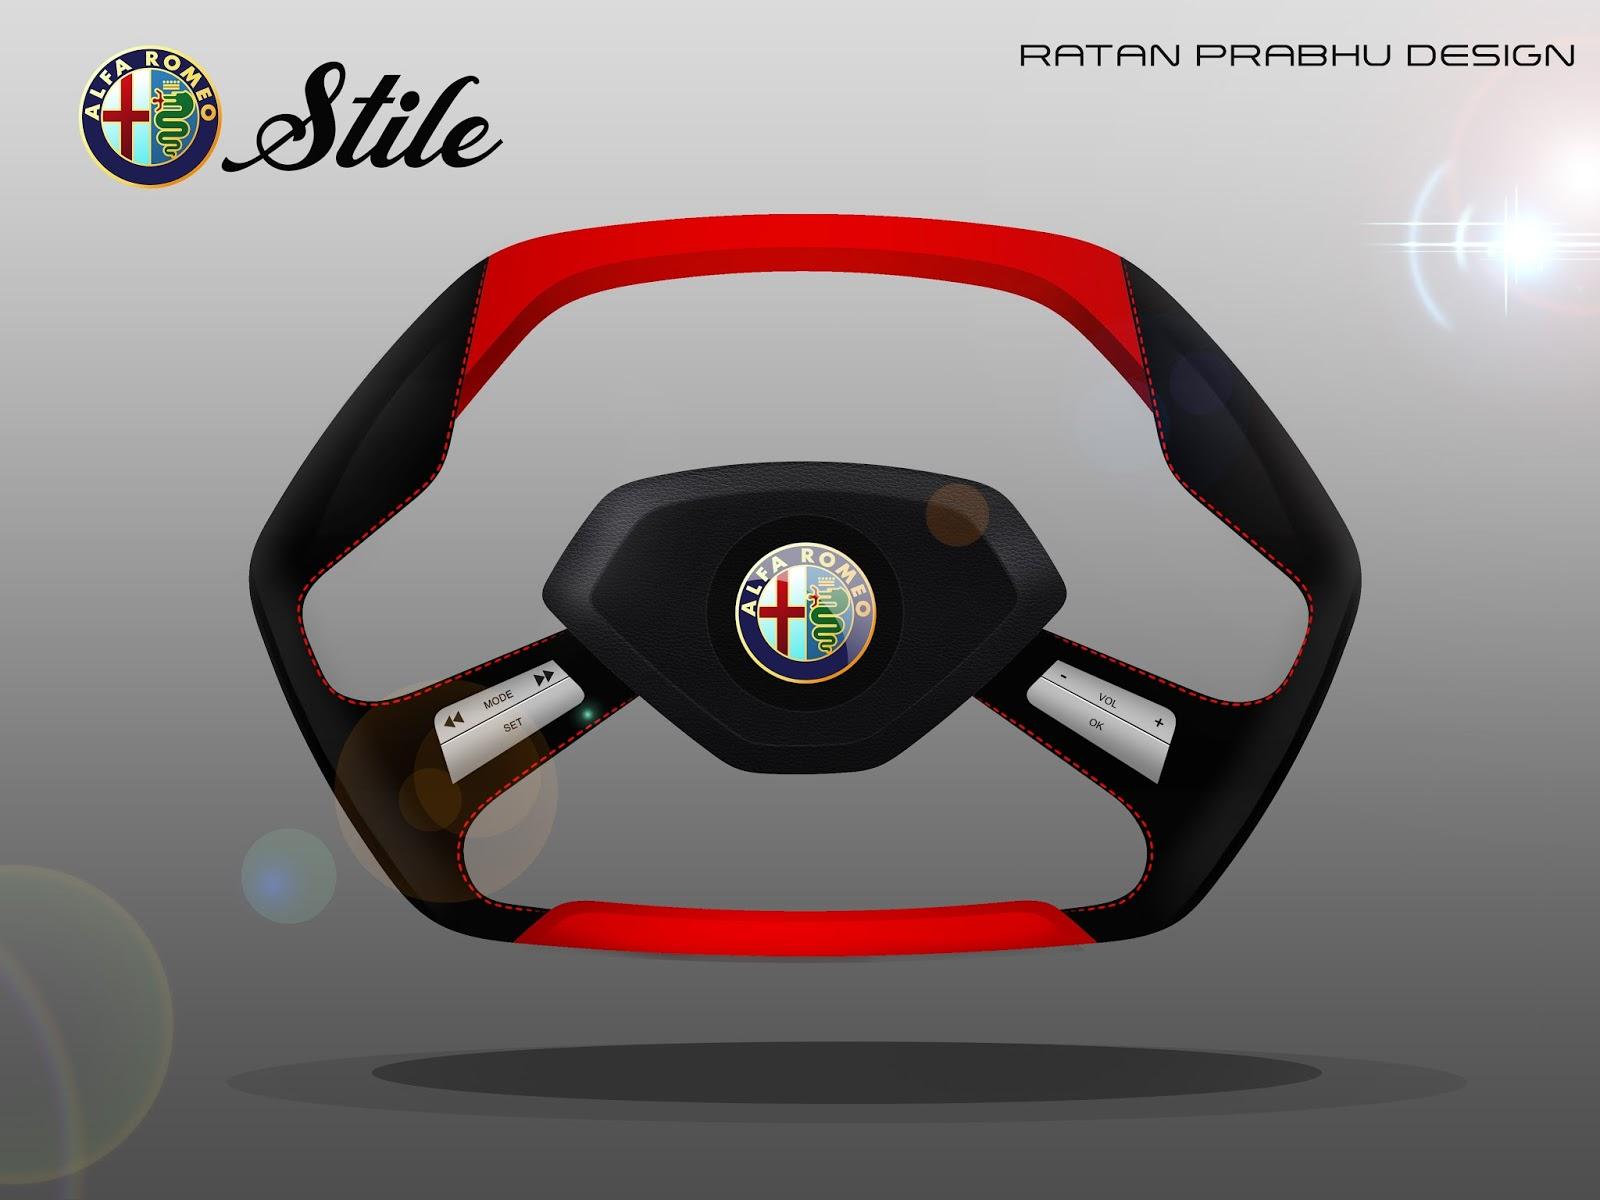 Tata Safari Render 2018 >> RATANDESIGNZ: Alfa Romeo Stile Concept Steering Wheel Design